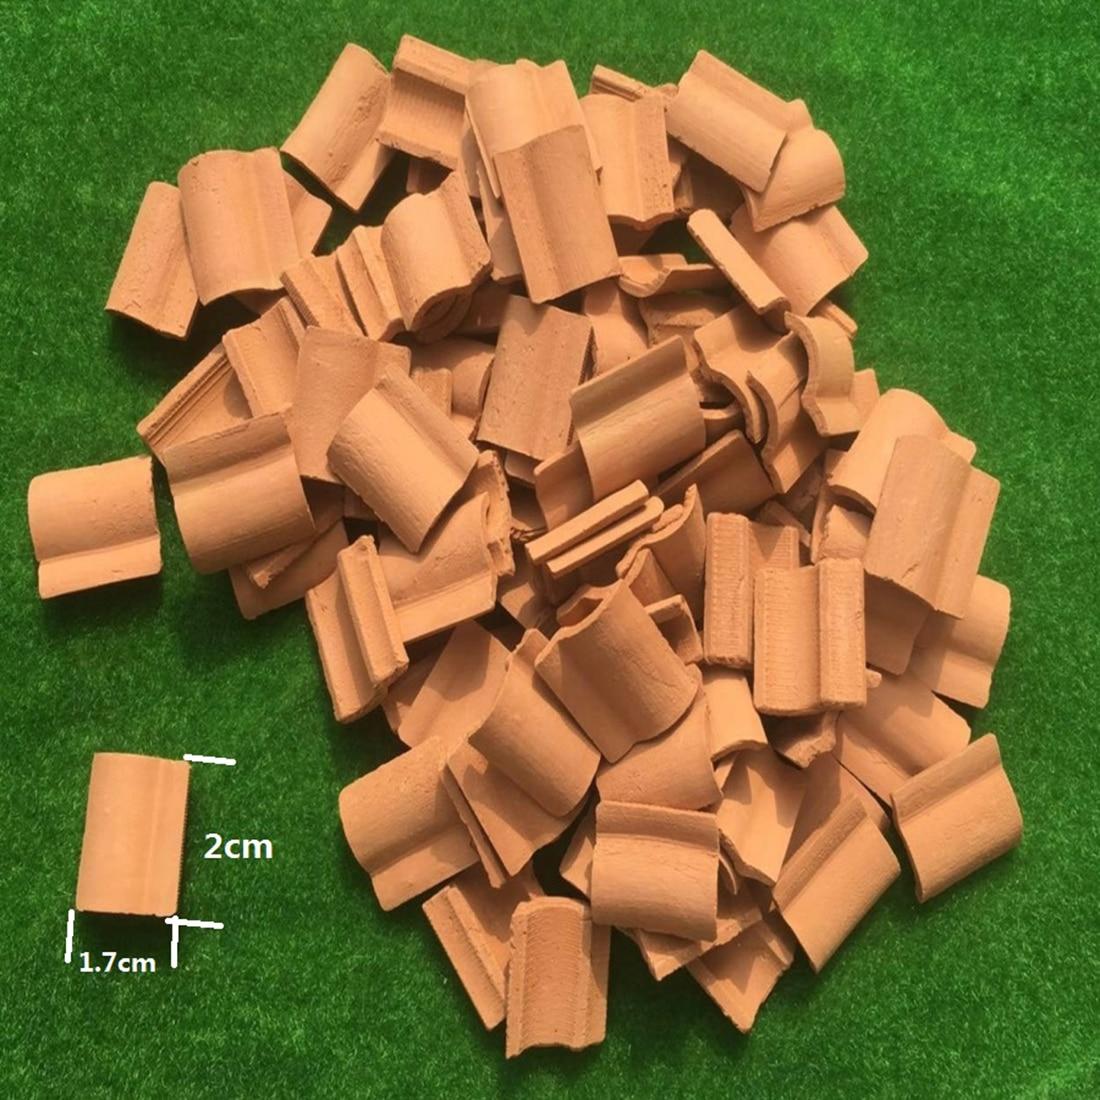 25Pcs/set 1:12 Scale DIY Sand Table Architecture Miniature Roof Tiles WWII Scene Mini Tiles Model Accessories  - Nacarat